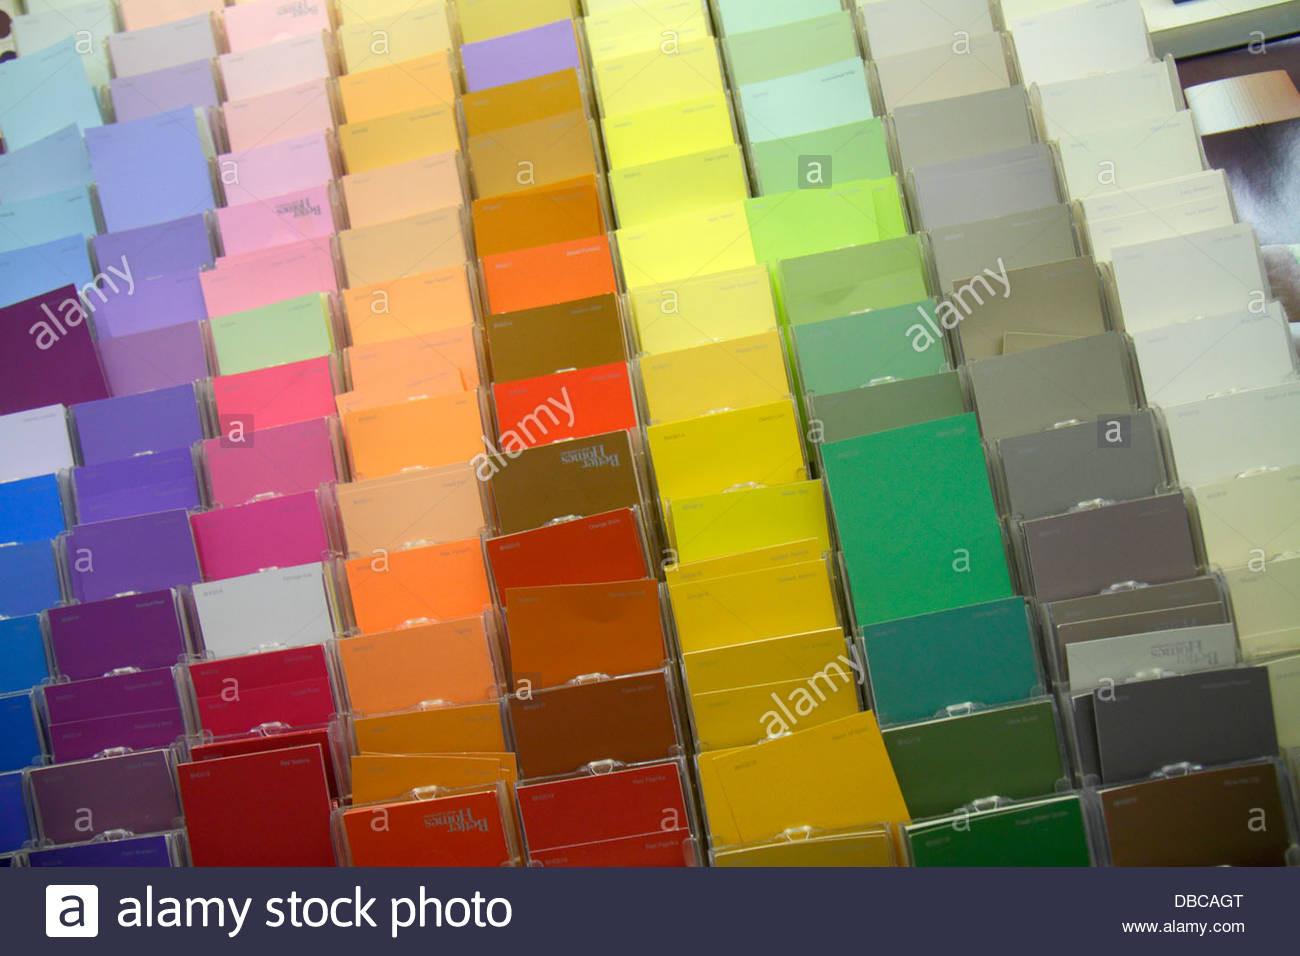 Best ideas about Walmart Paint Colors . Save or Pin Hallandale Beach Stock s & Hallandale Beach Stock Now.